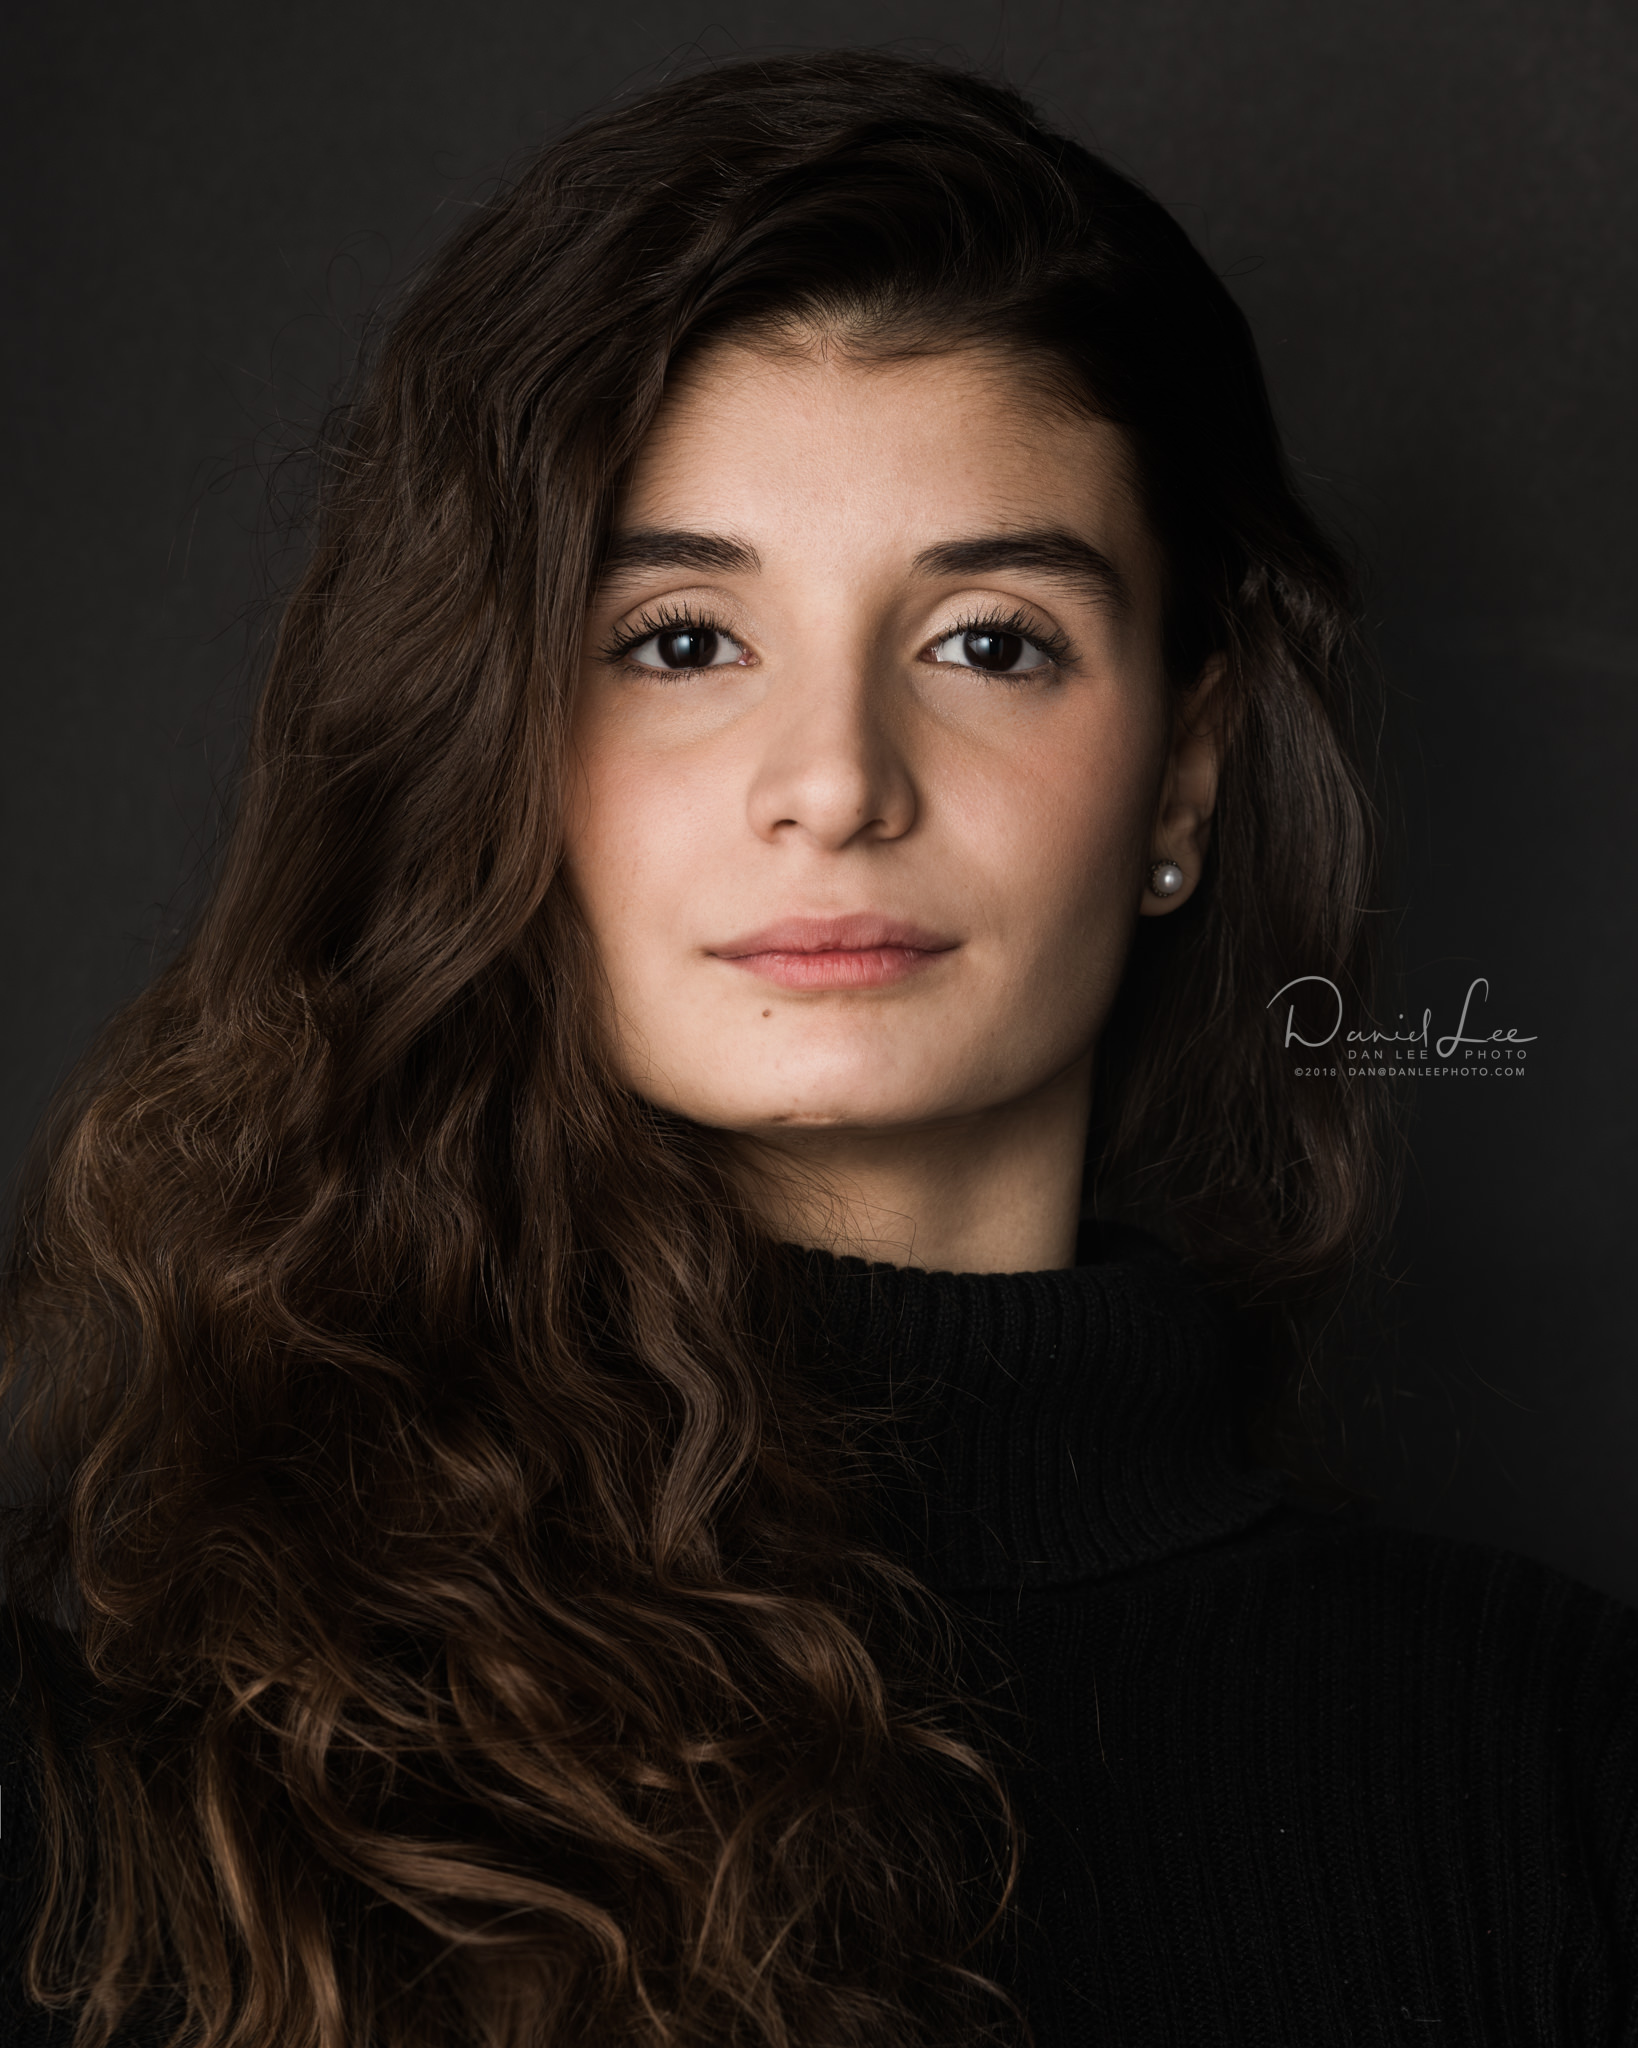 Manoela Leopoldino